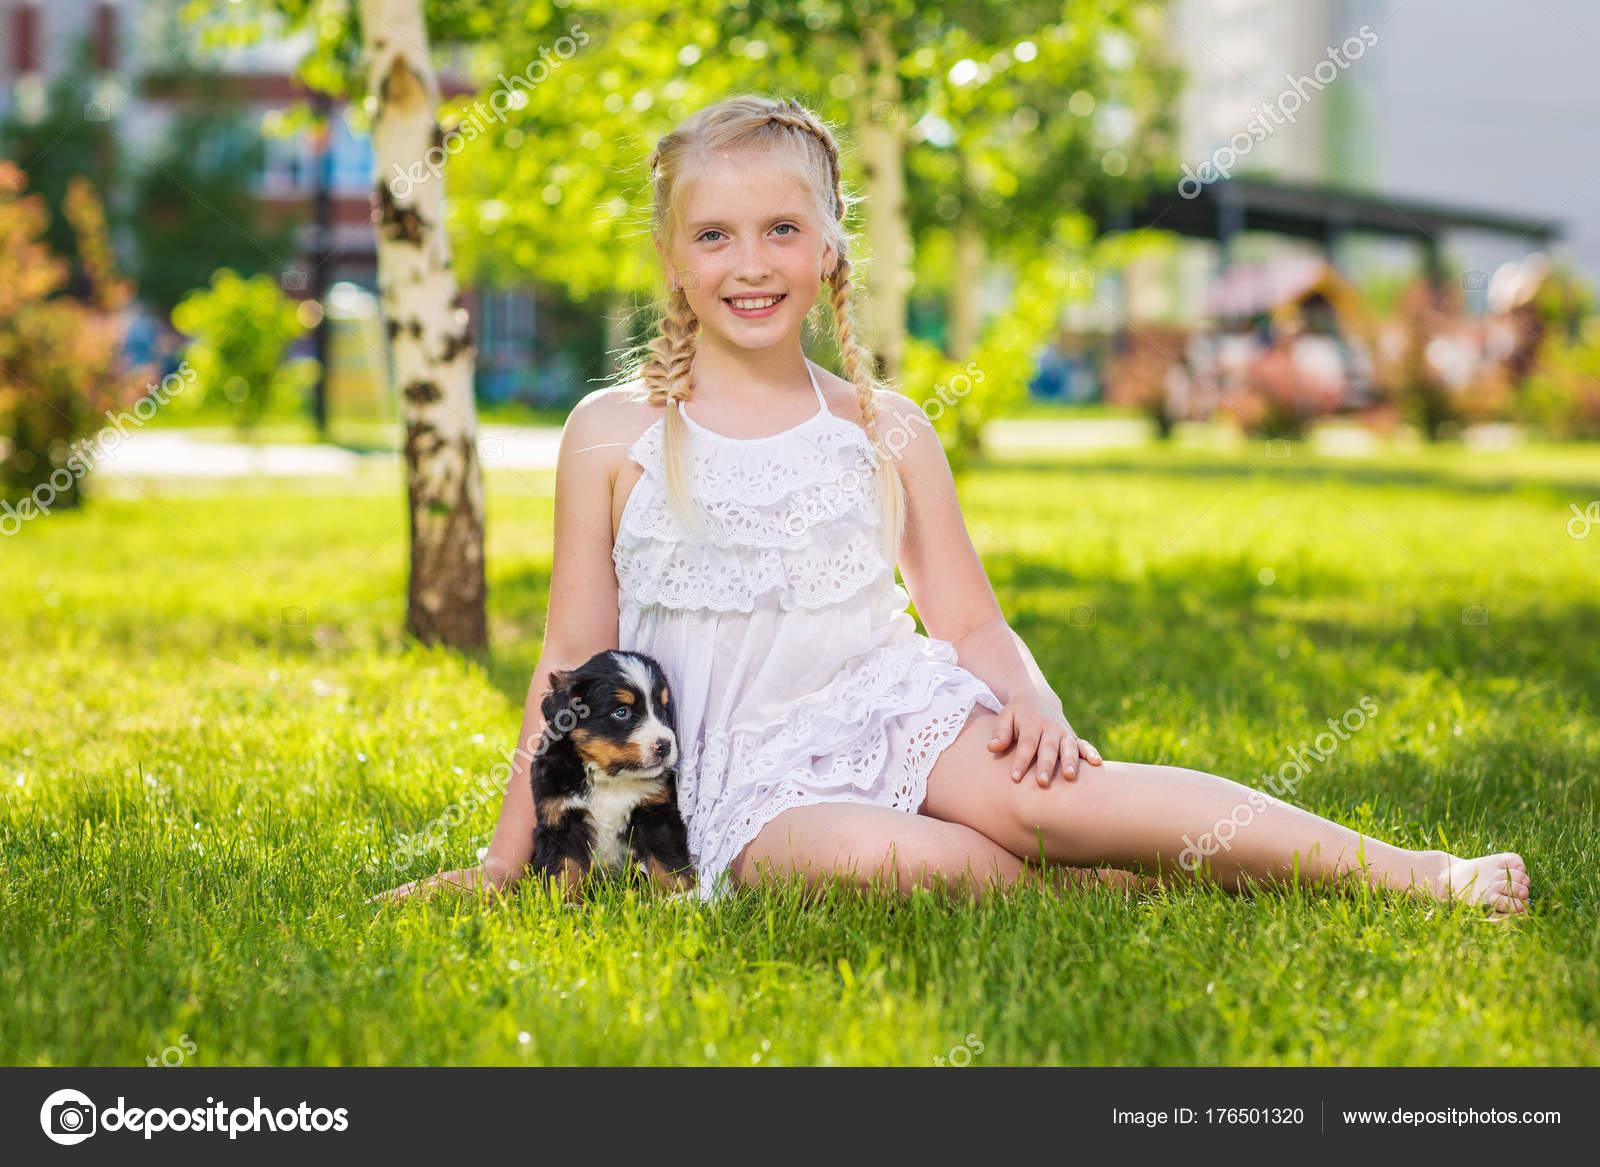 Little Blonde Girl Playing Cute Black Puppy Sitting Green Grass